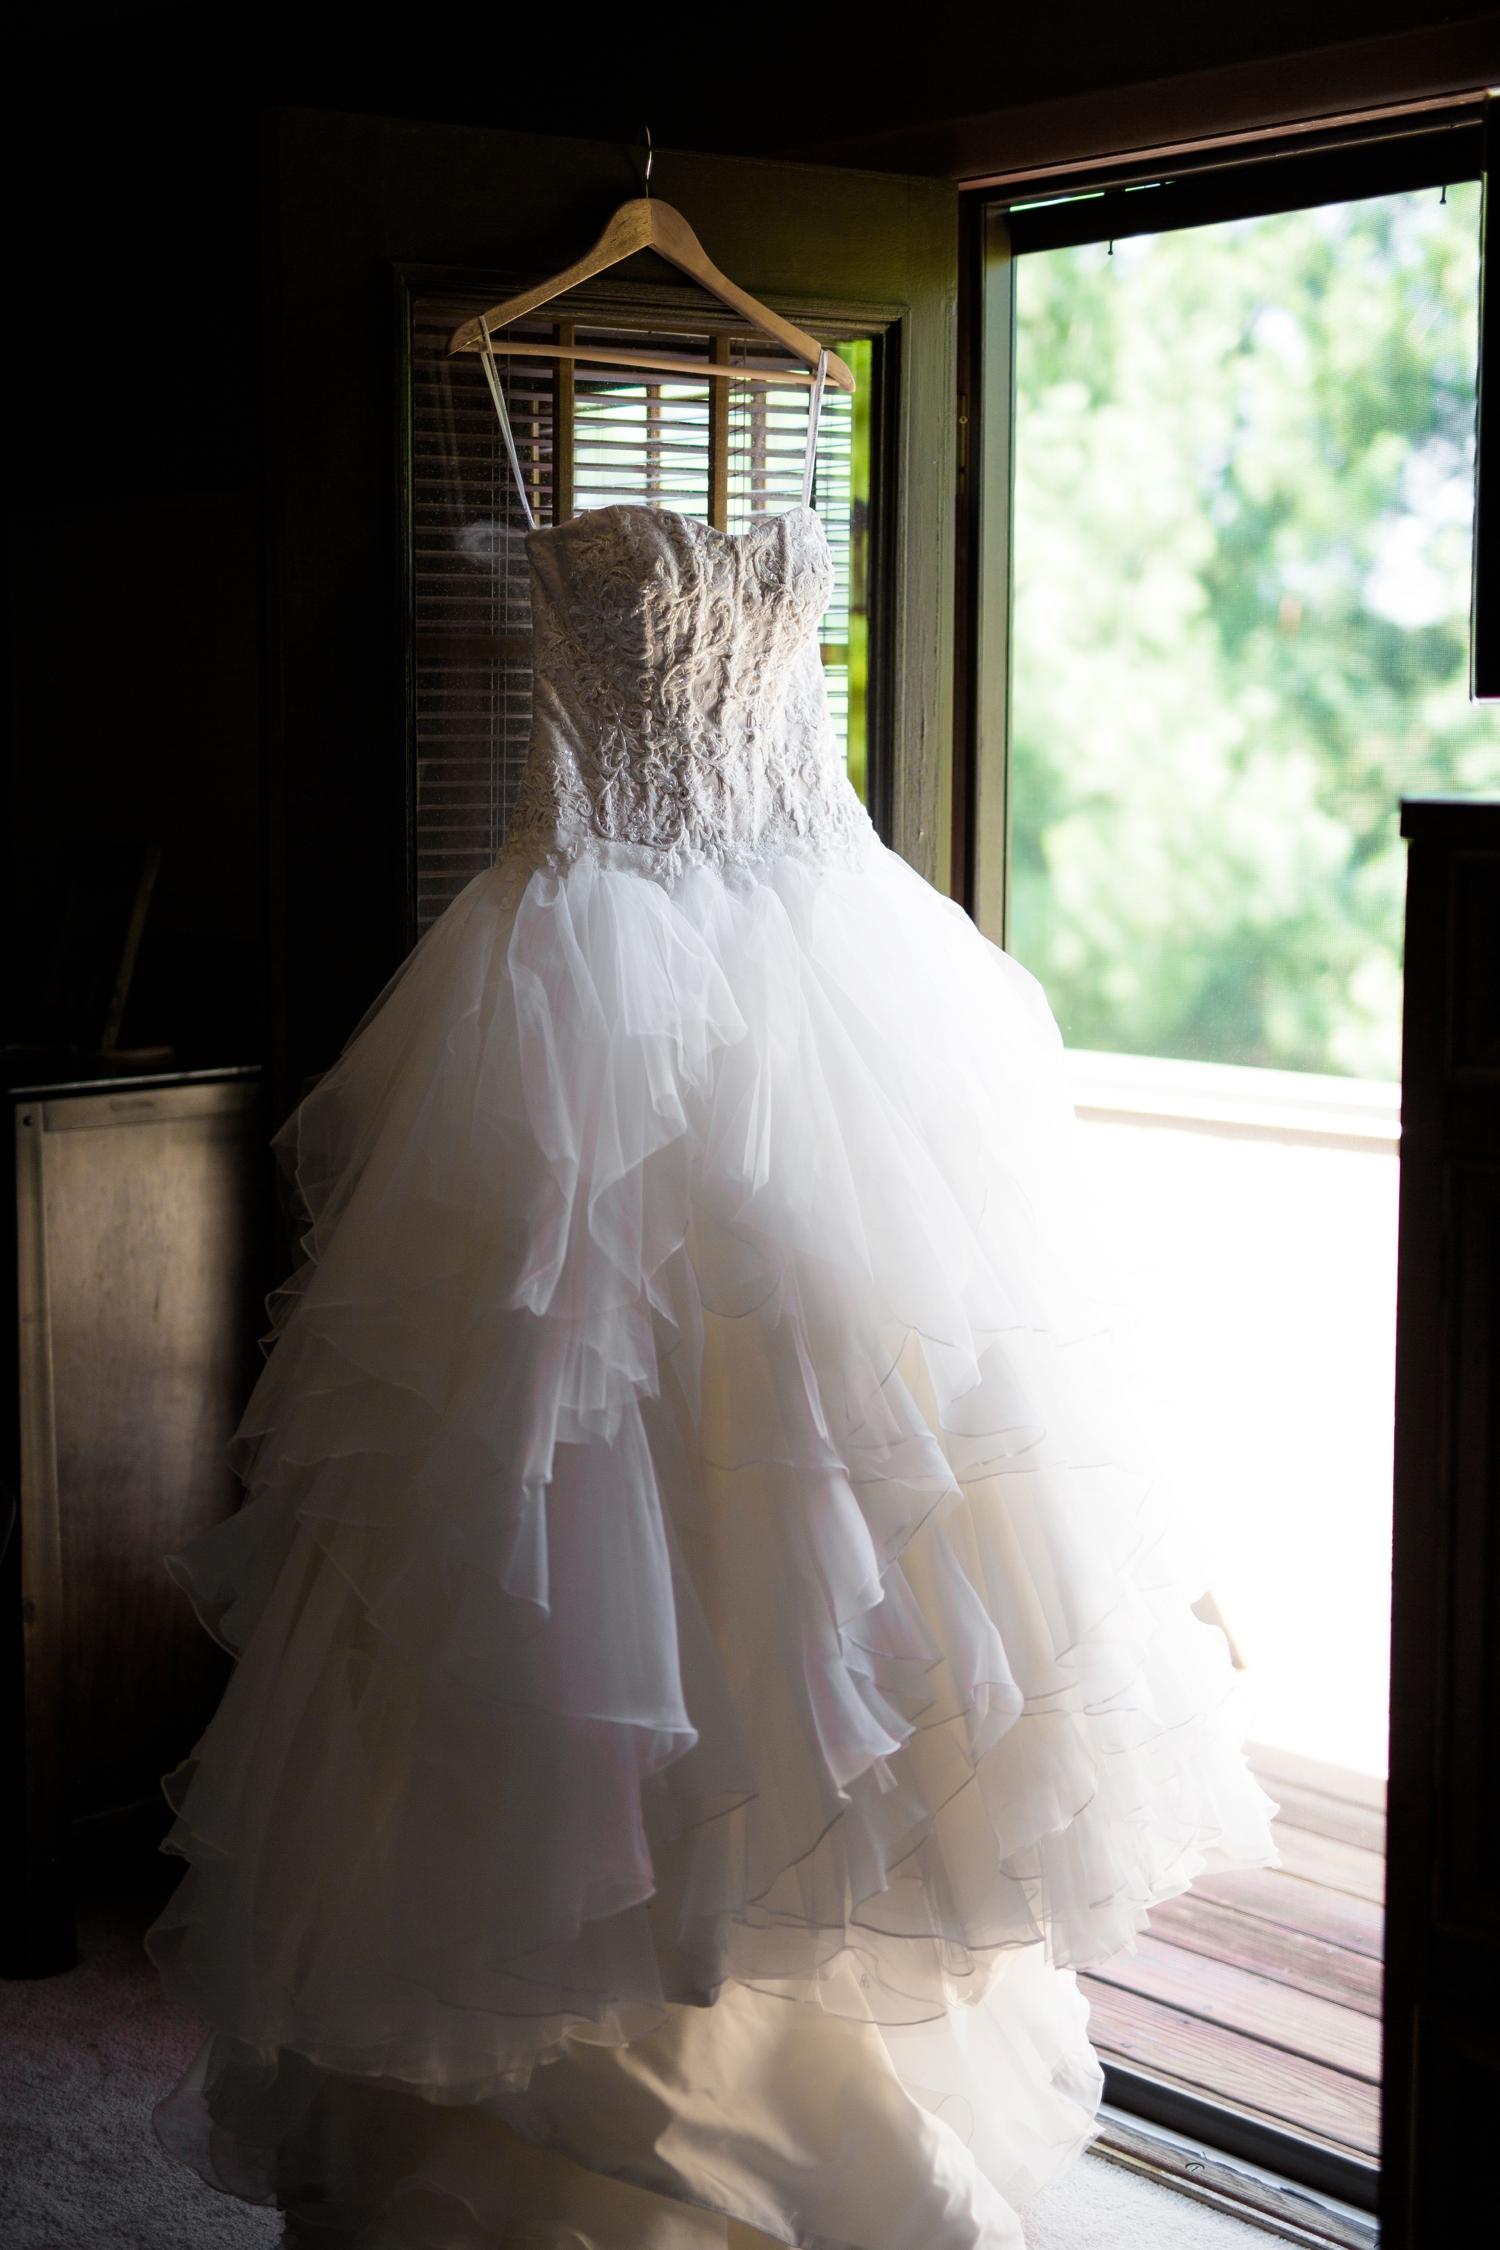 cranberry wedding photographer, pittsburgh wedding photographer